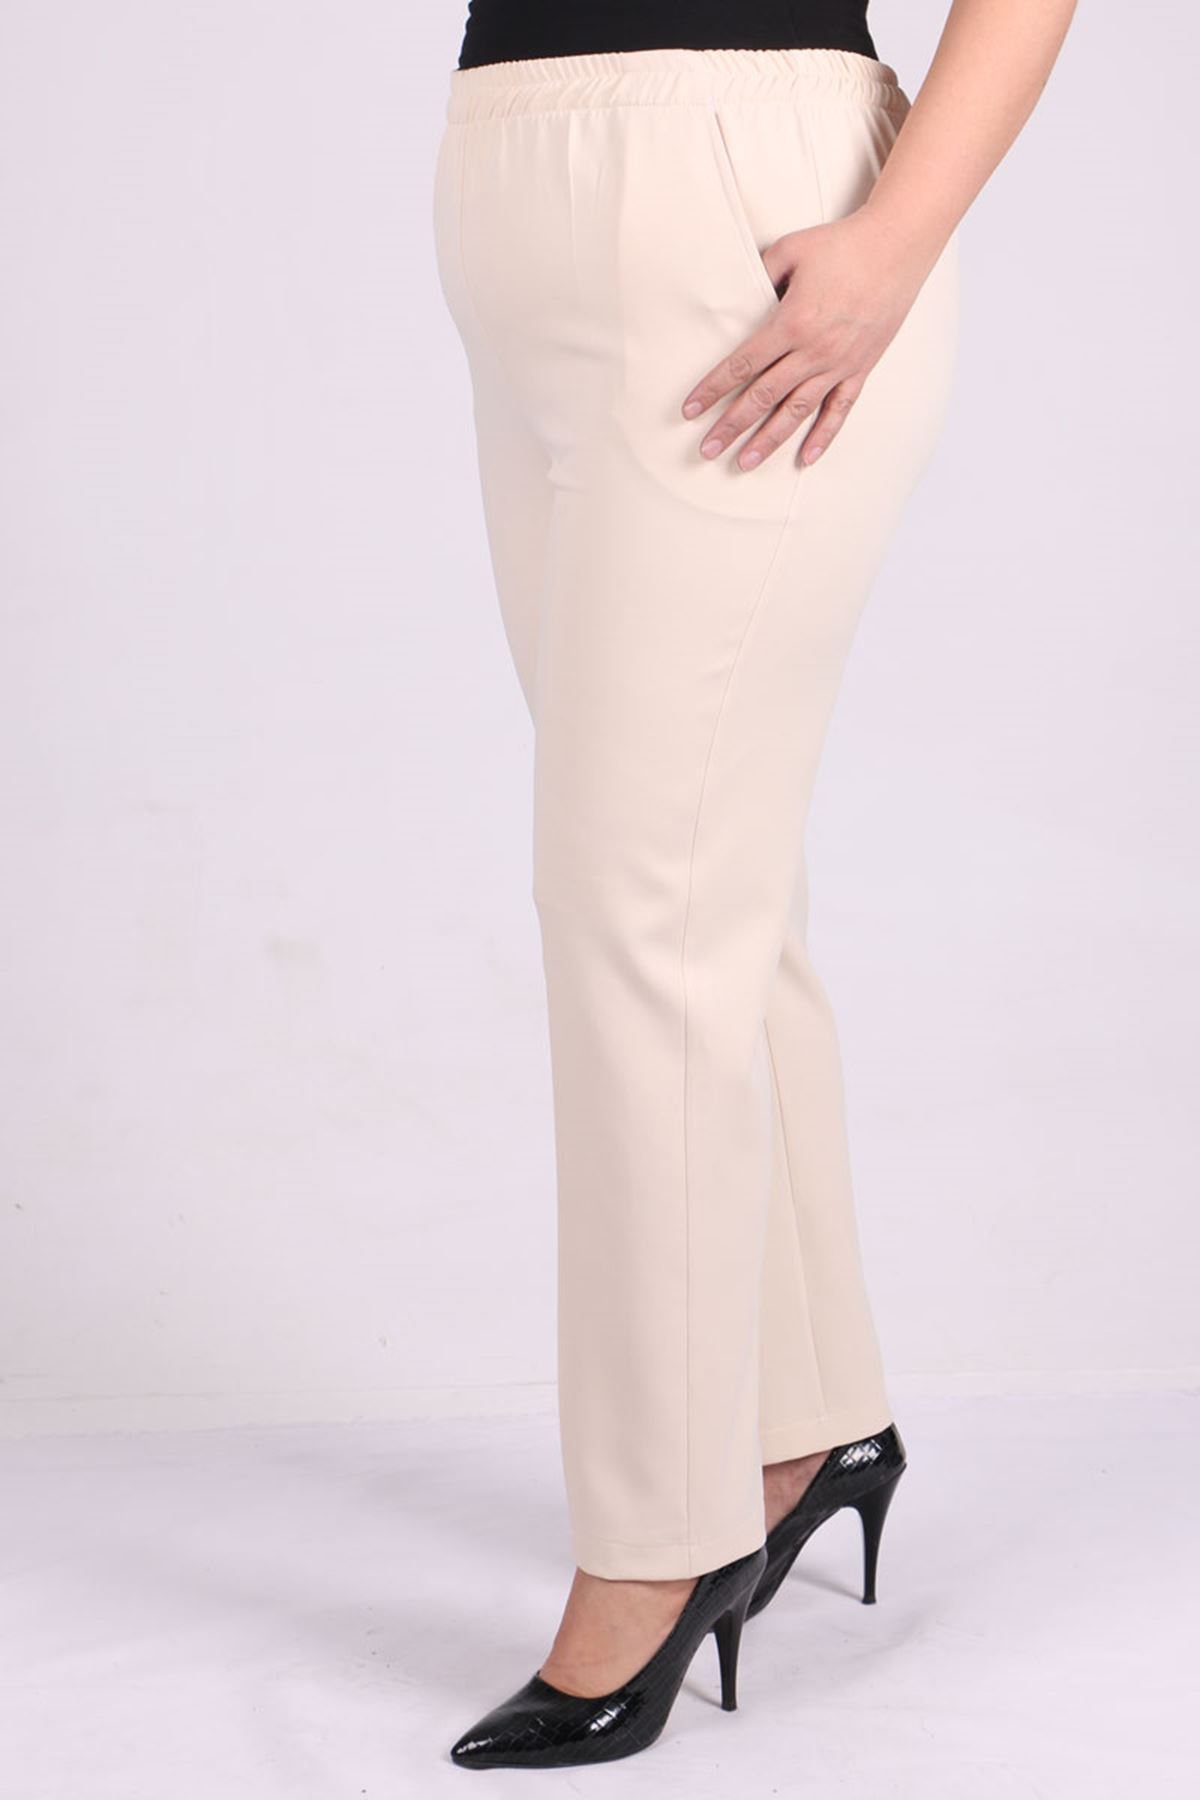 D-9025 Büyük Beden Defolu Beli Lastikli  Boru Paça Pantolon - Taş